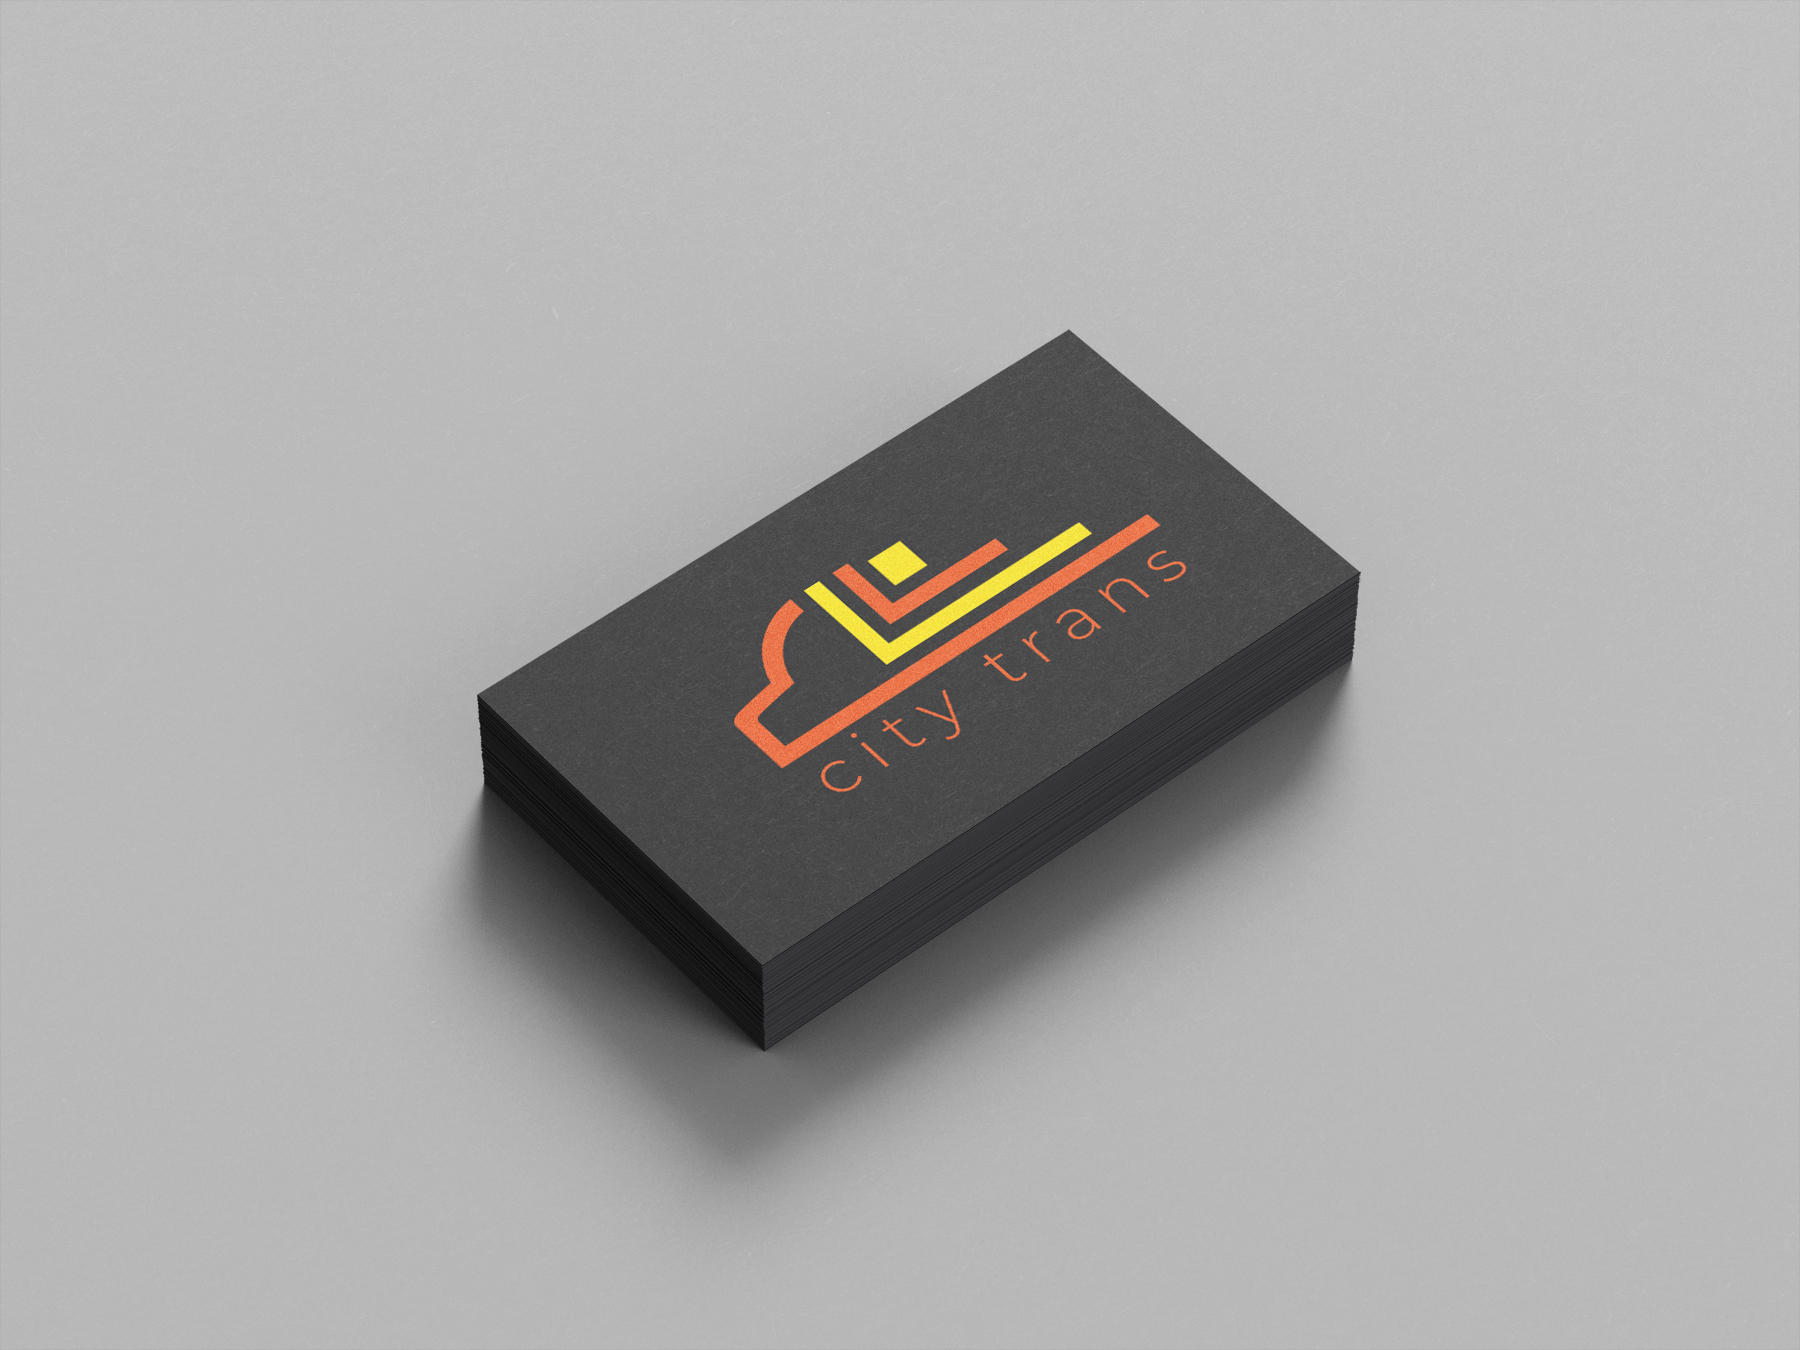 Разработка Логотипа транспортной компании фото f_7105e6e3306e952c.jpg